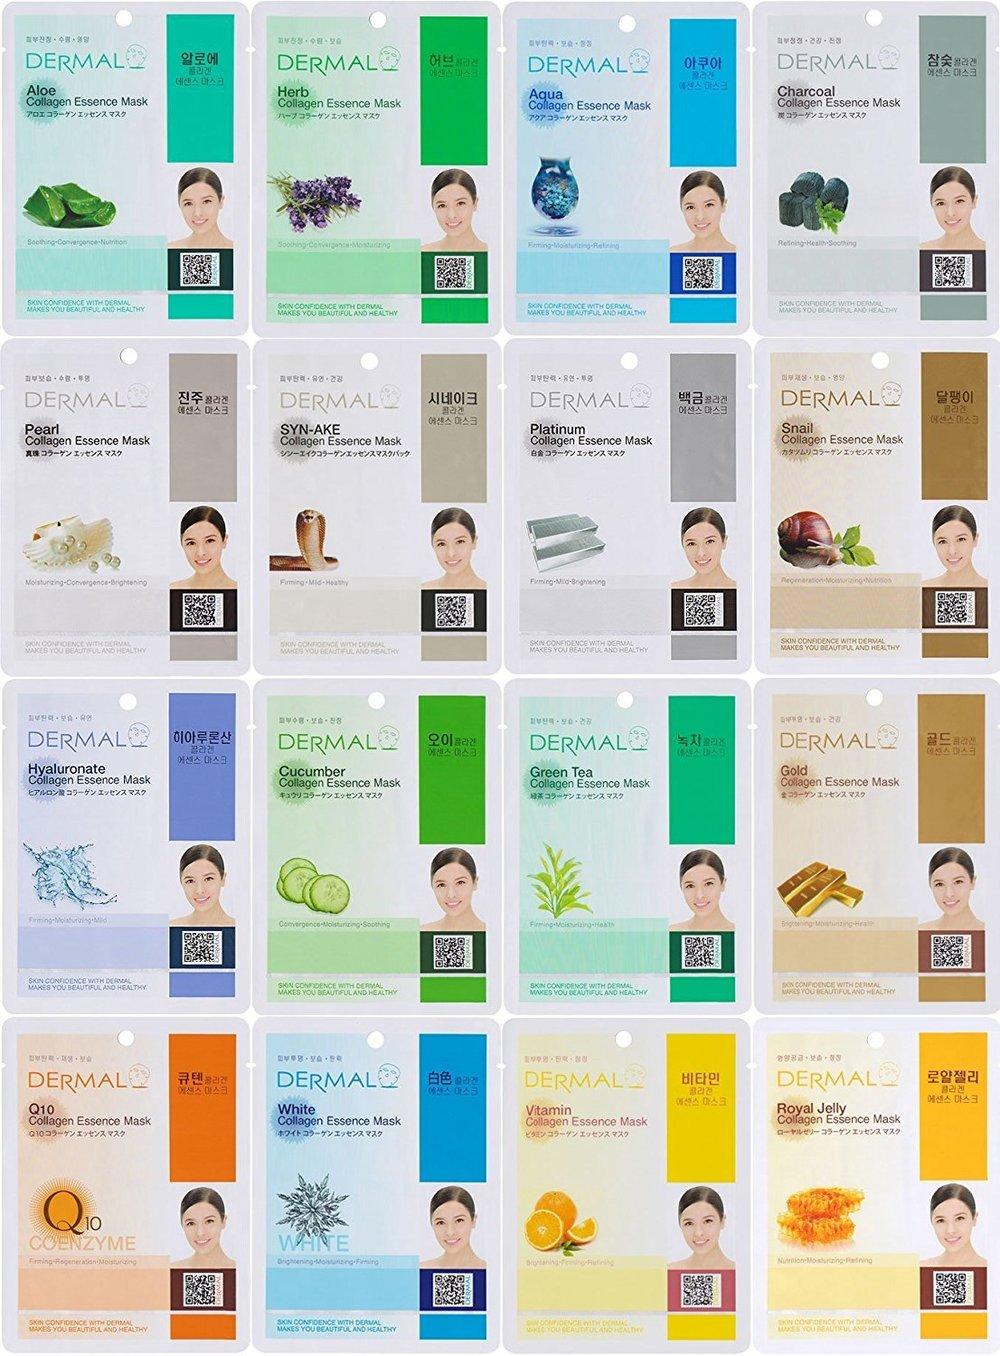 Dermal Korea Collagen Essence Full Face Facial Mask Sheet, 16 Combo Pack ($10)